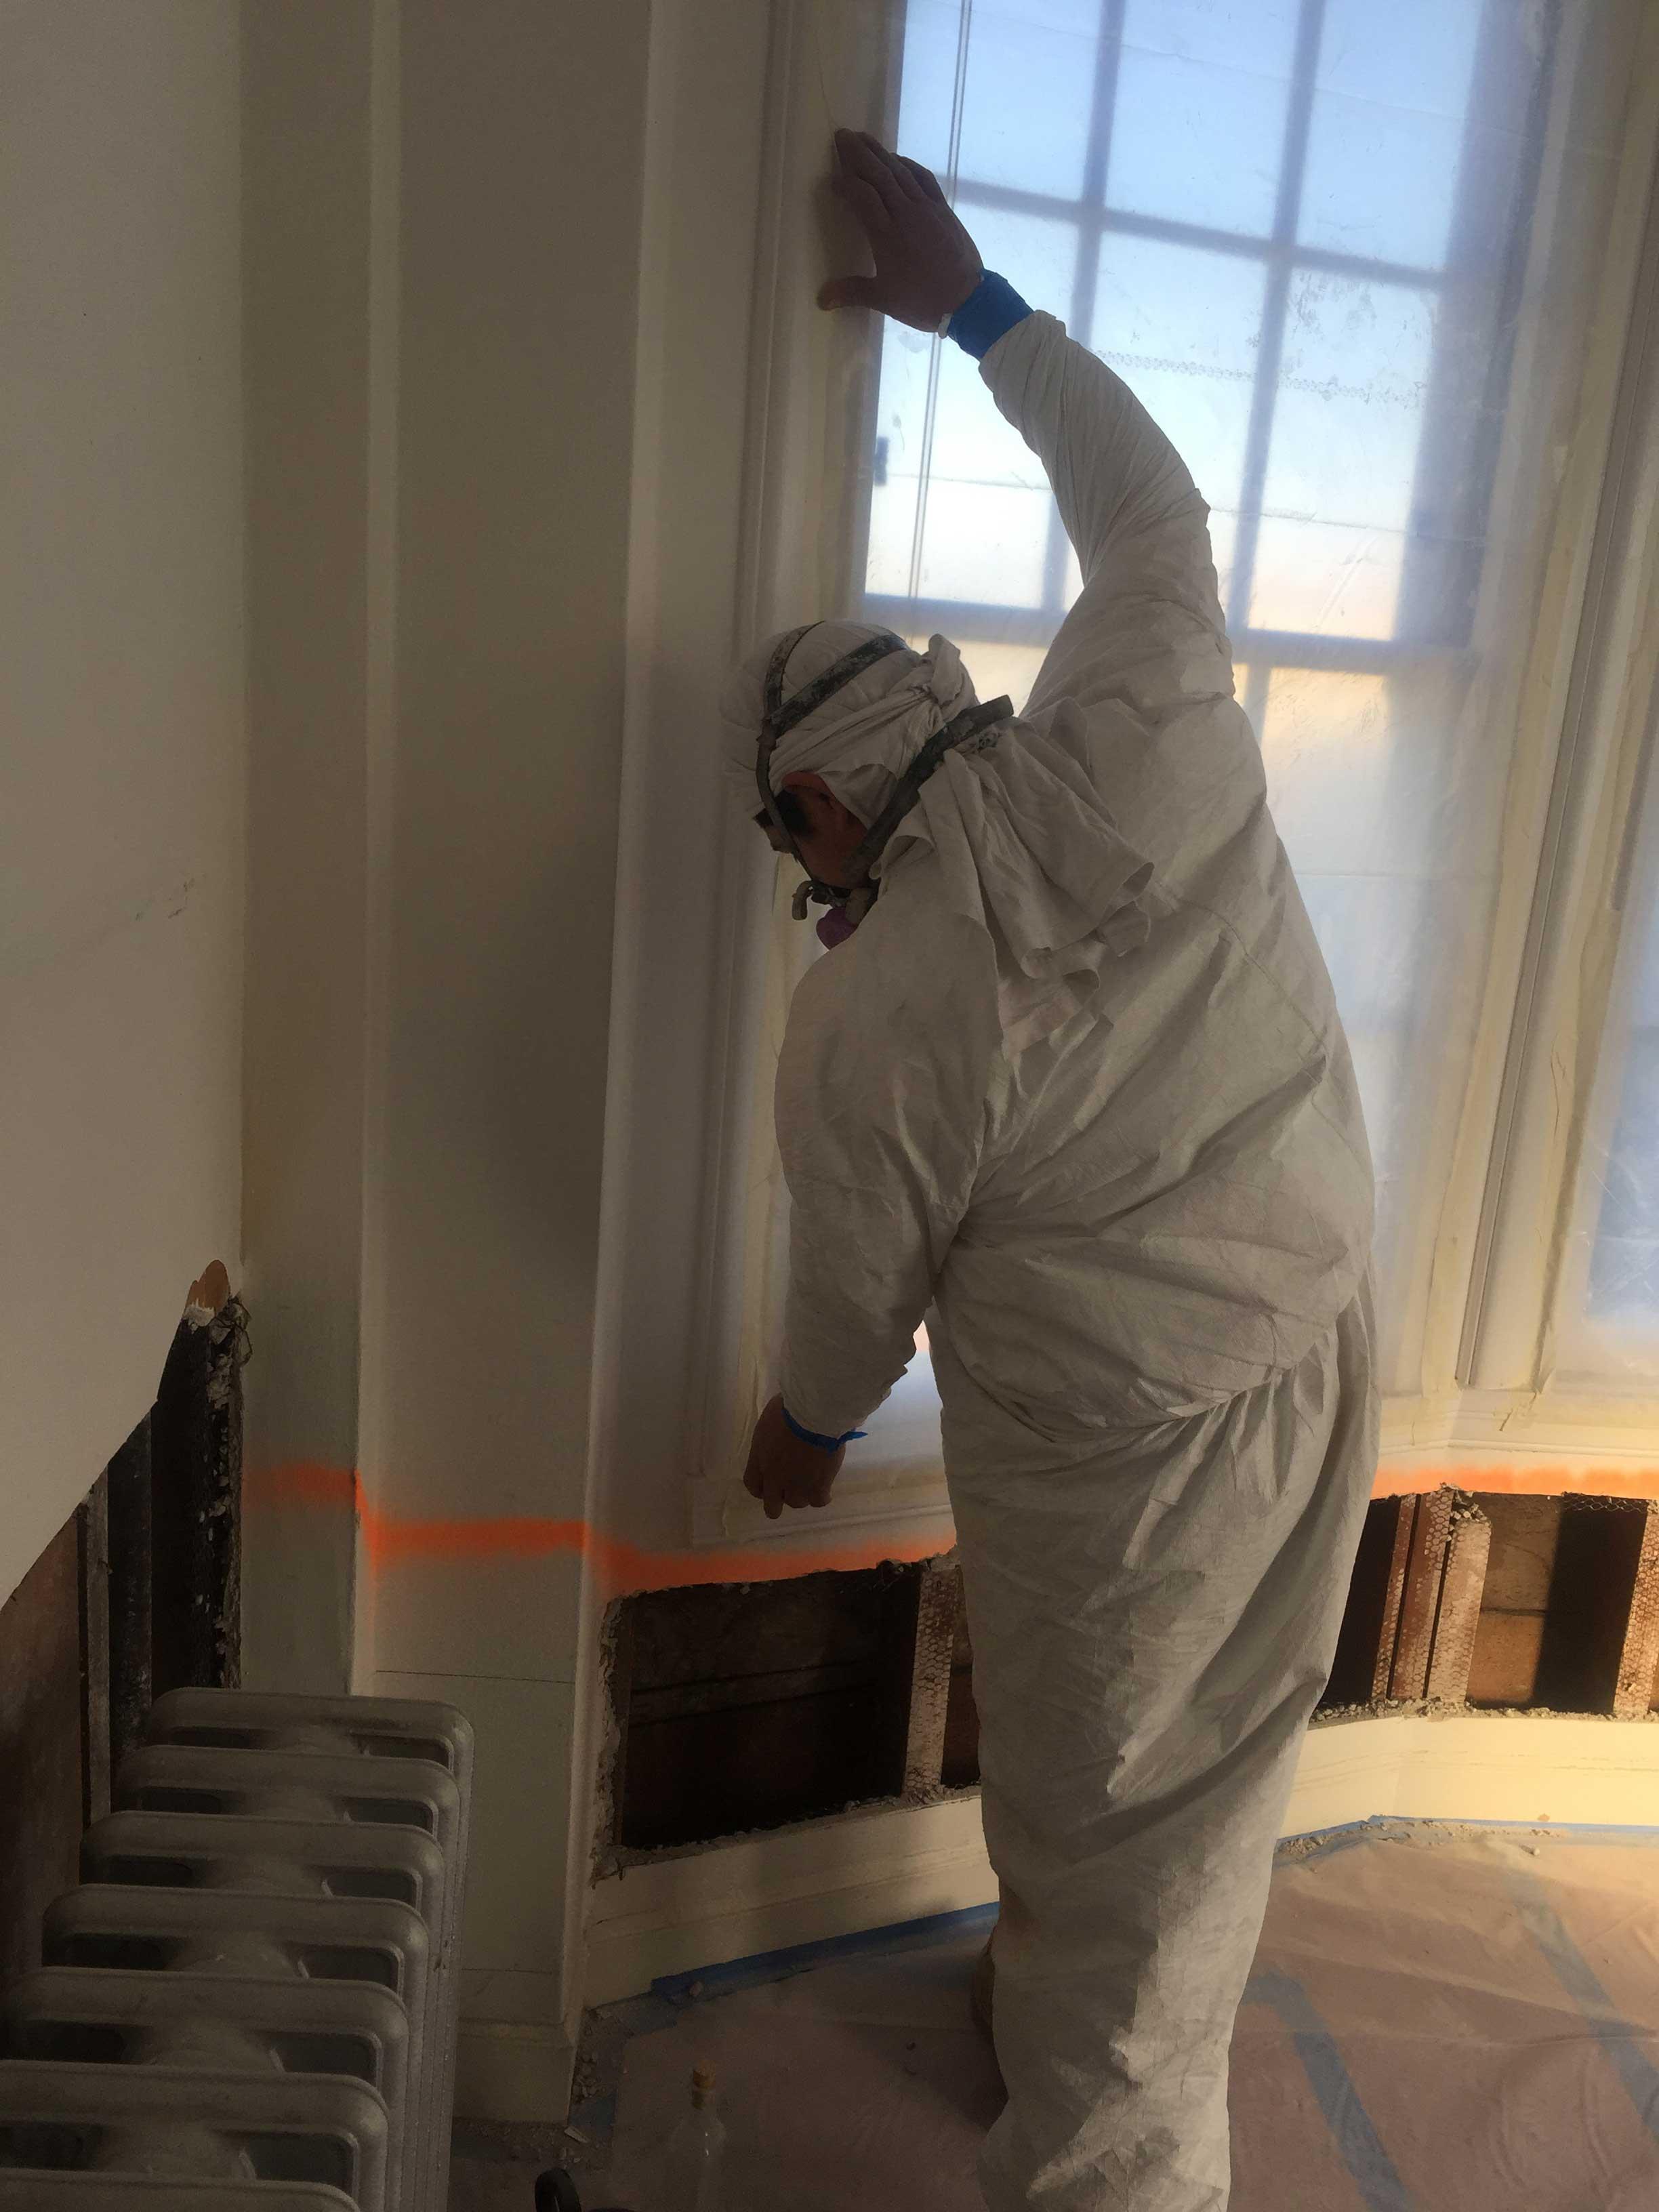 Employee Preparing for Lead Remediation